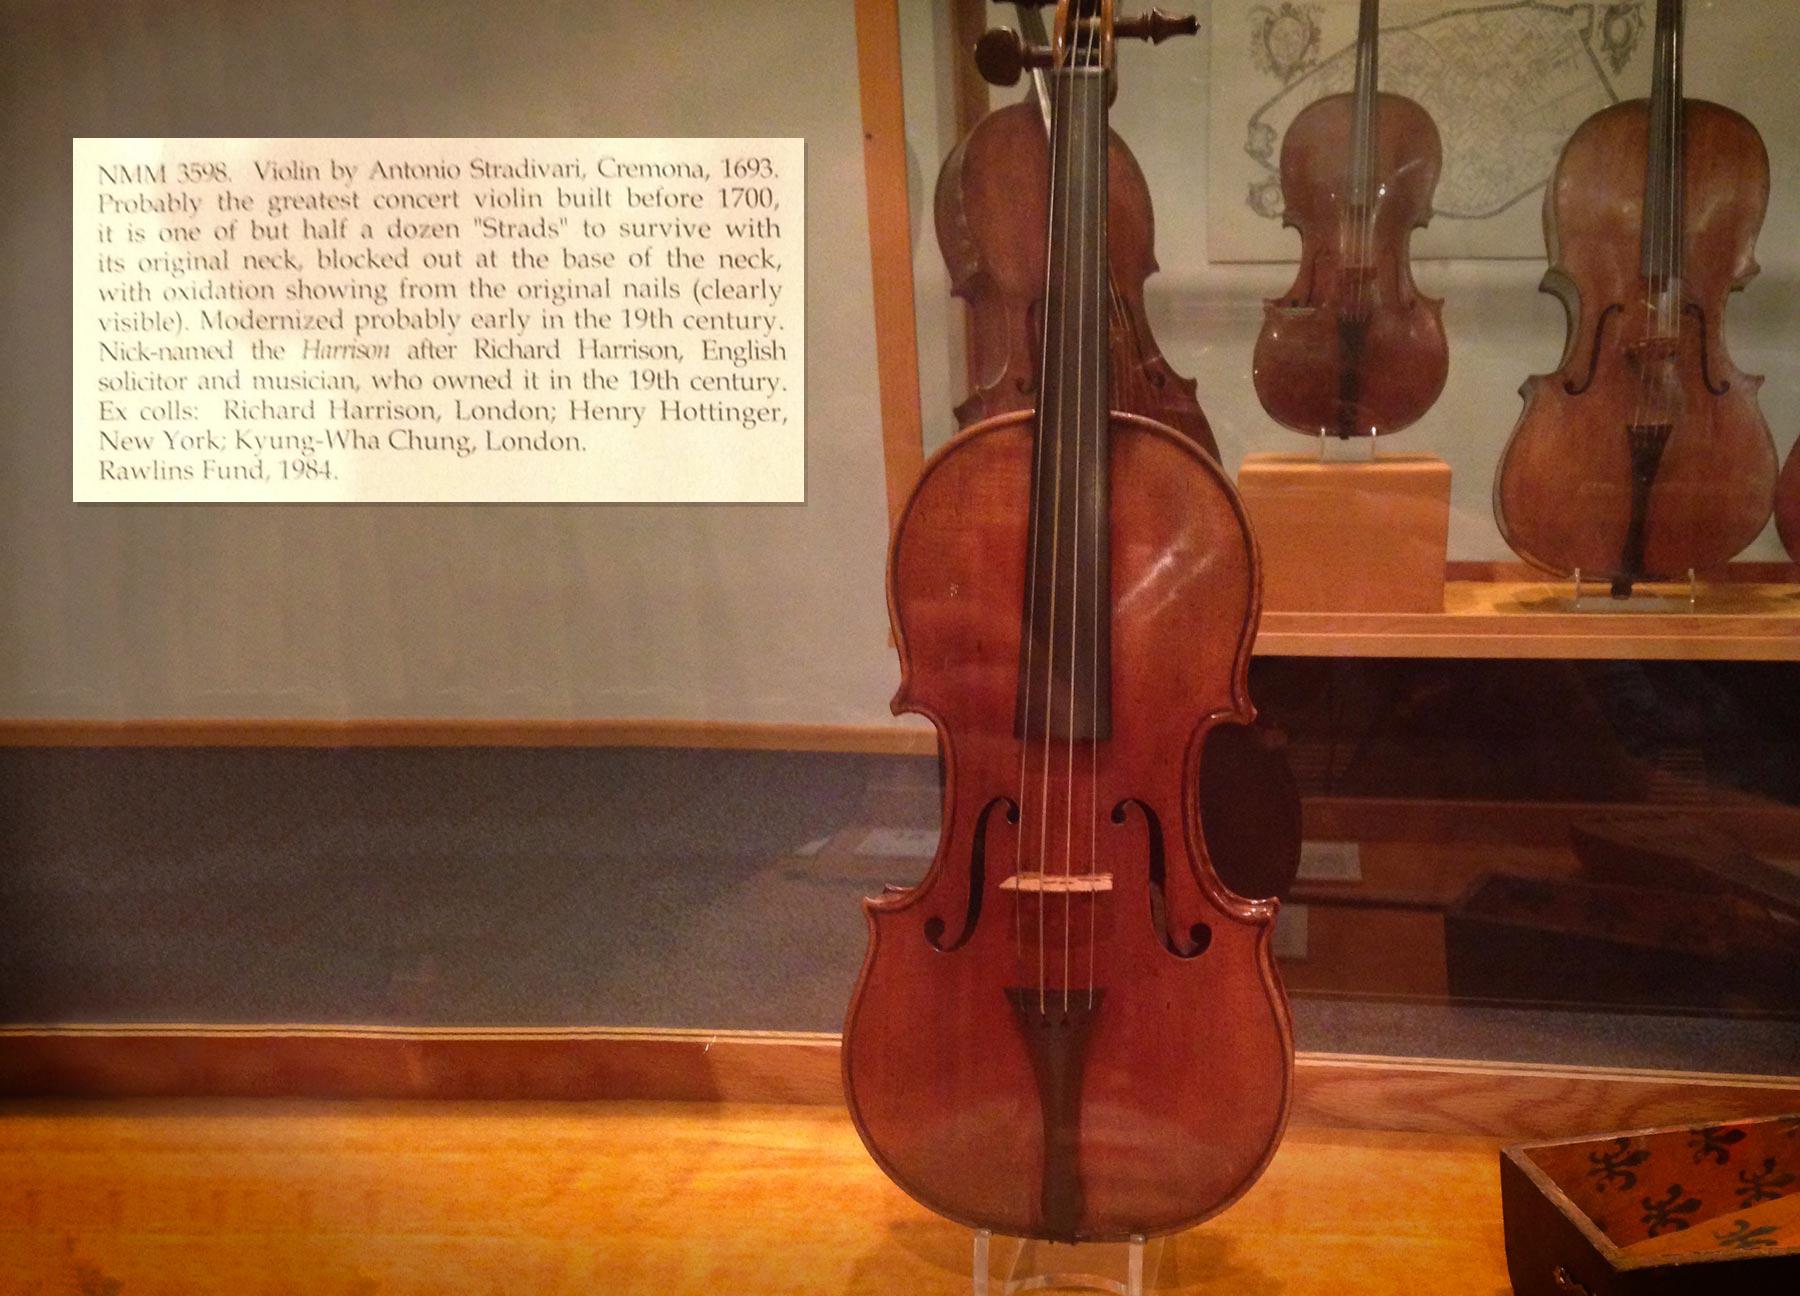 Exhibit of Stradivari violins at the University of South Dakota National Music Museum